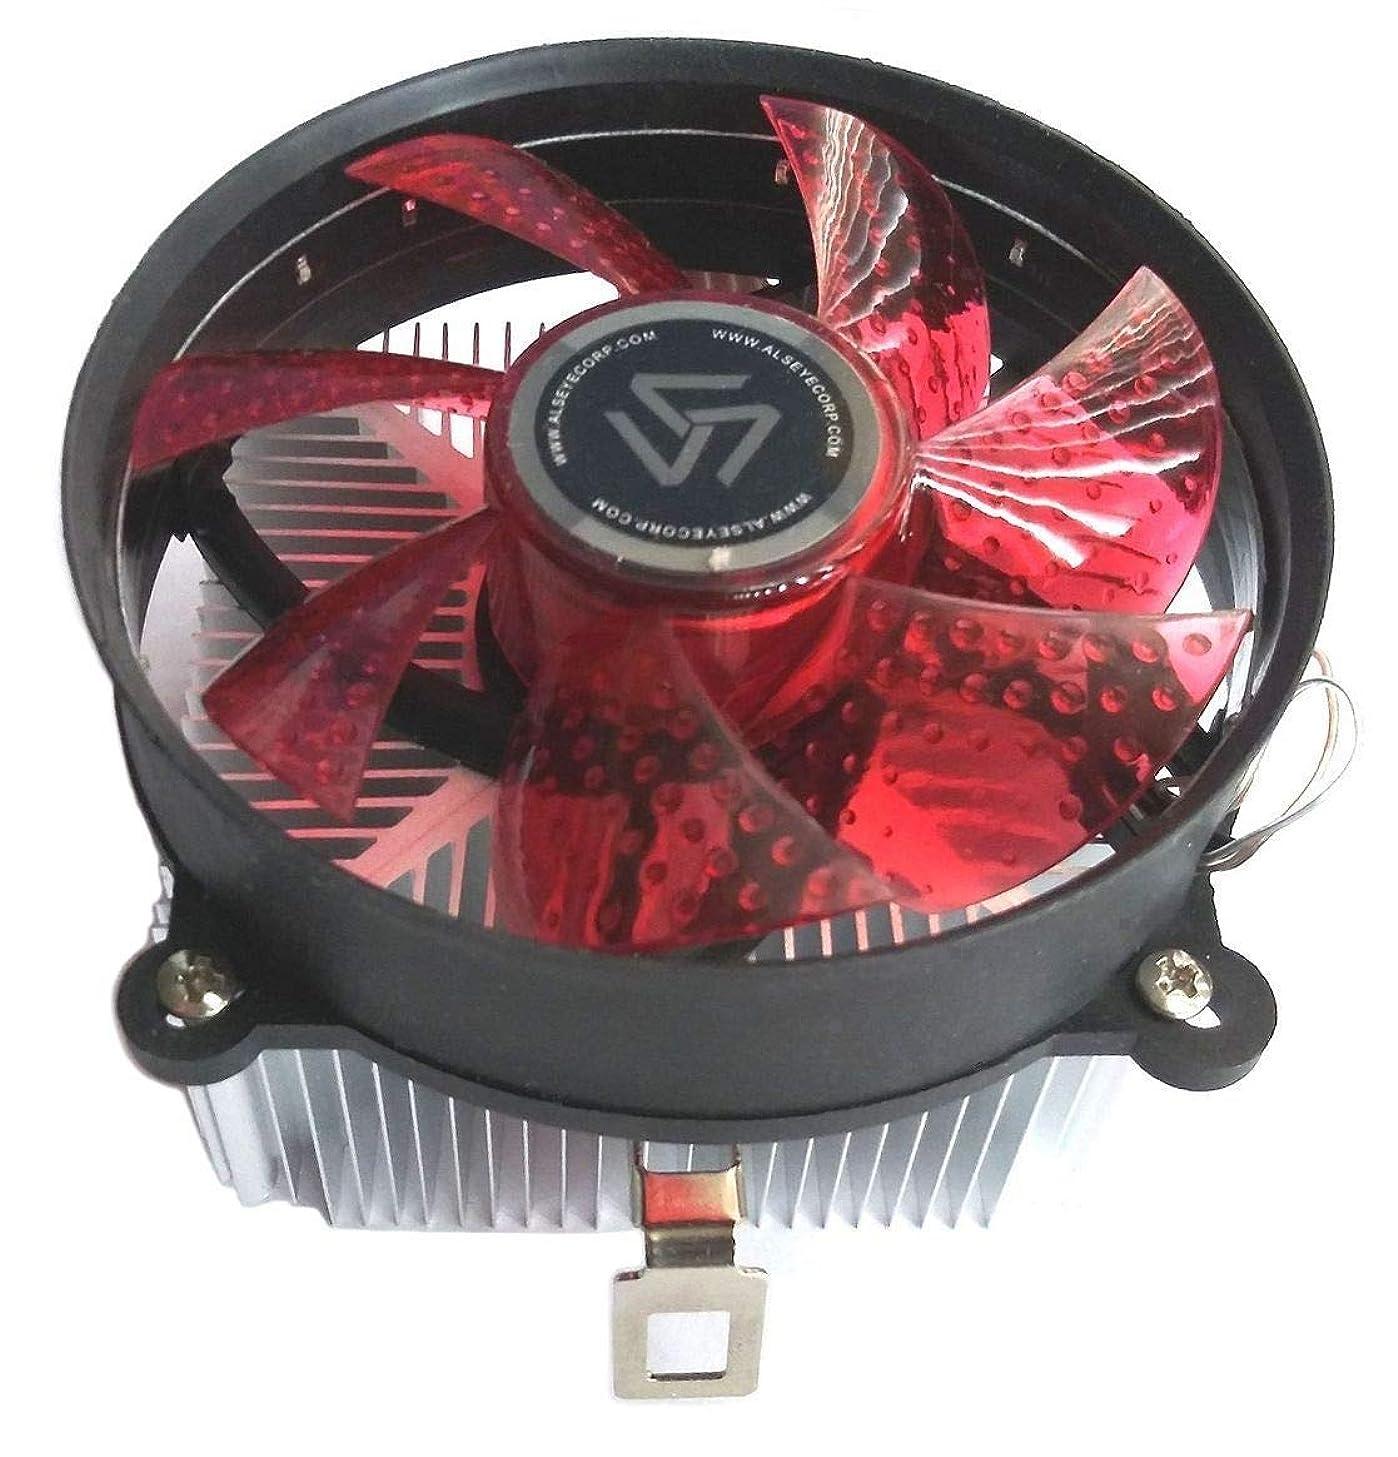 Premium Red LED AMD Socket AM3 / AM2 / 1207/940 / 939/754 3-Pin Connector CPU Cooler with Aluminum Heatsink